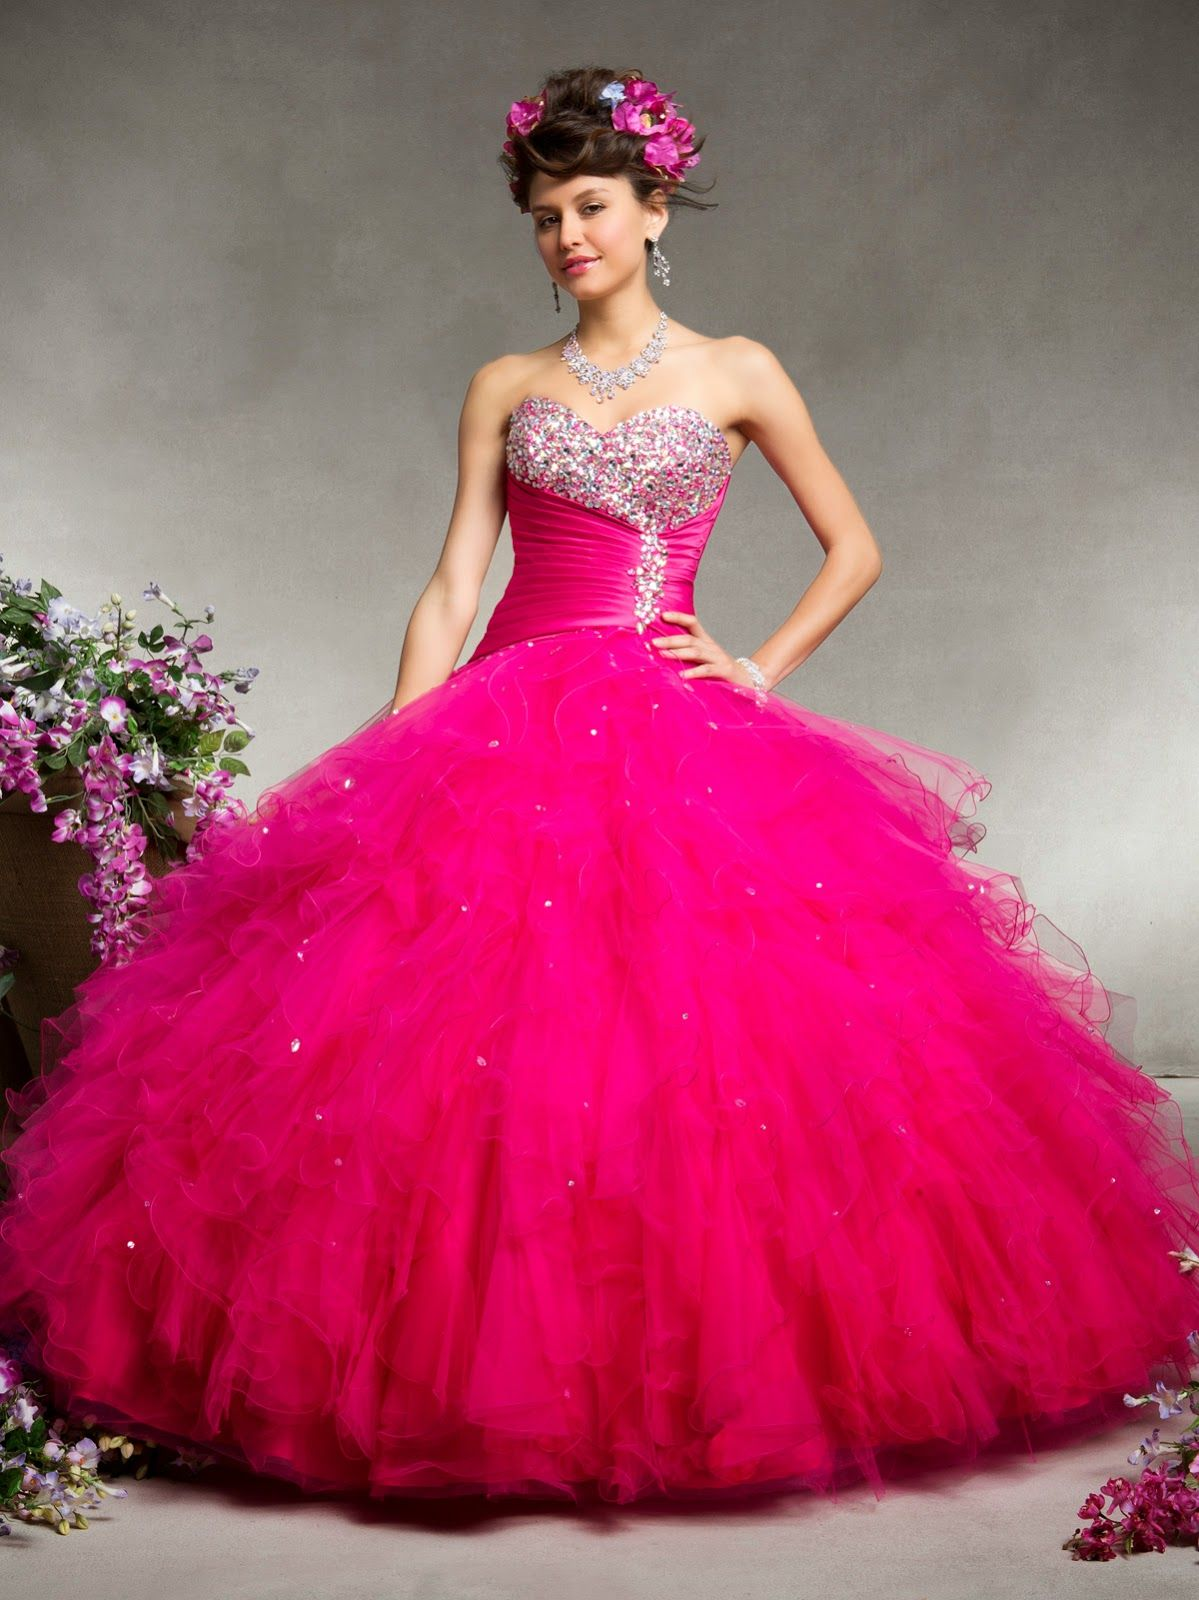 ... Off the Shoulder Beads Lace Sashes Formal Dresses. Vizcaya by Mori Lee  88075 Elegant Ball Gown. Fabulosos vestidos de 15 años  db00154d4953